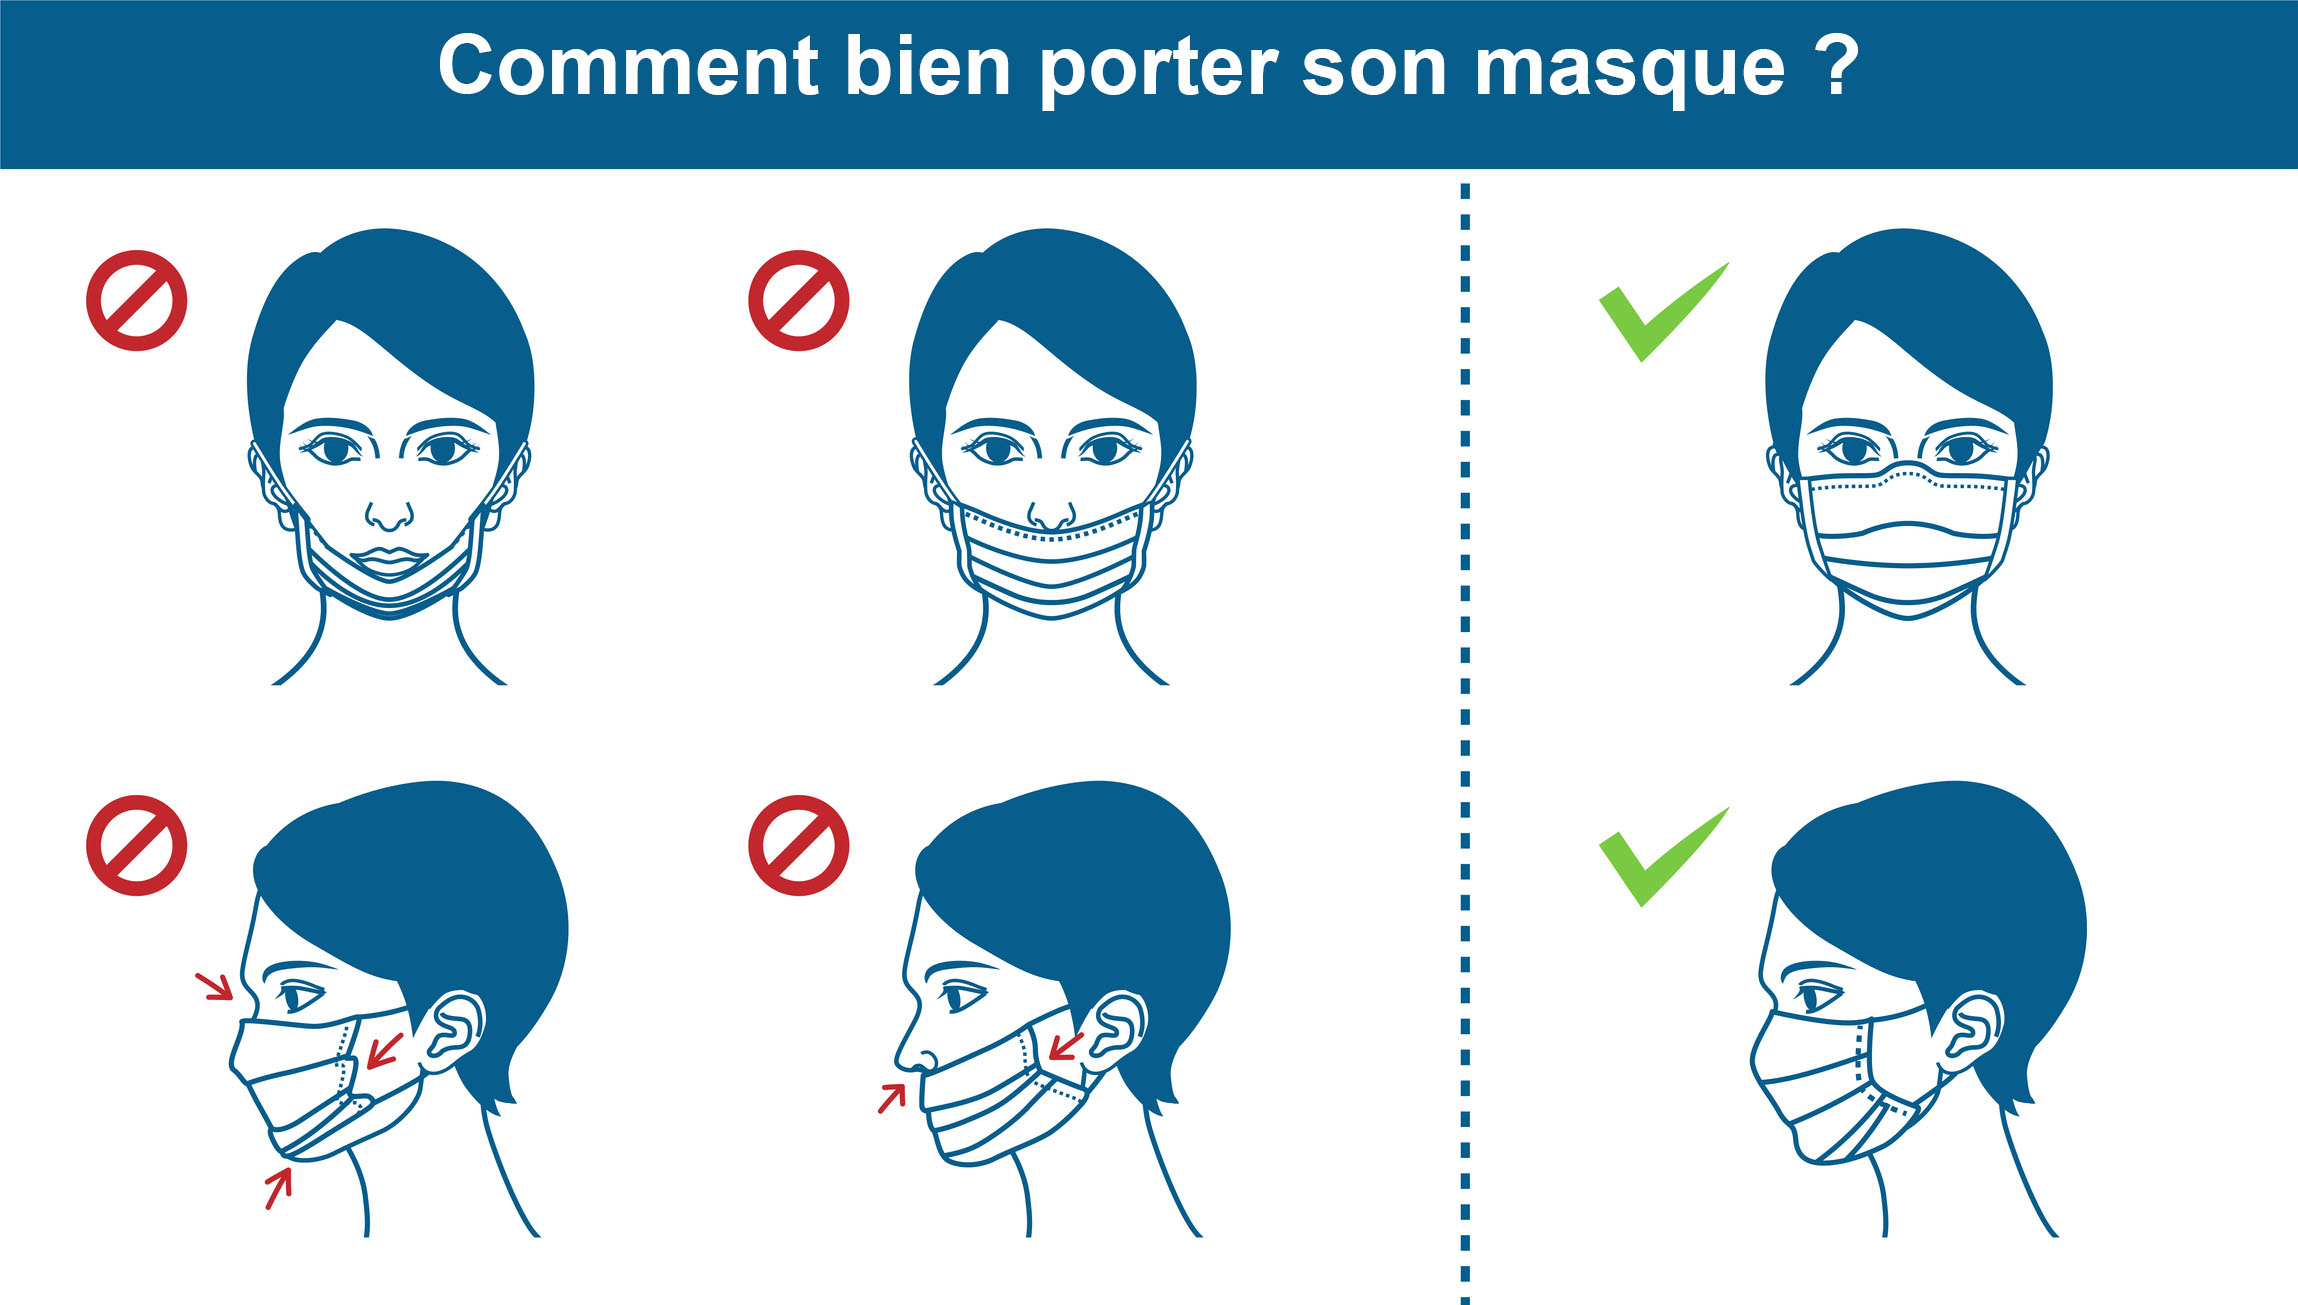 porter masque